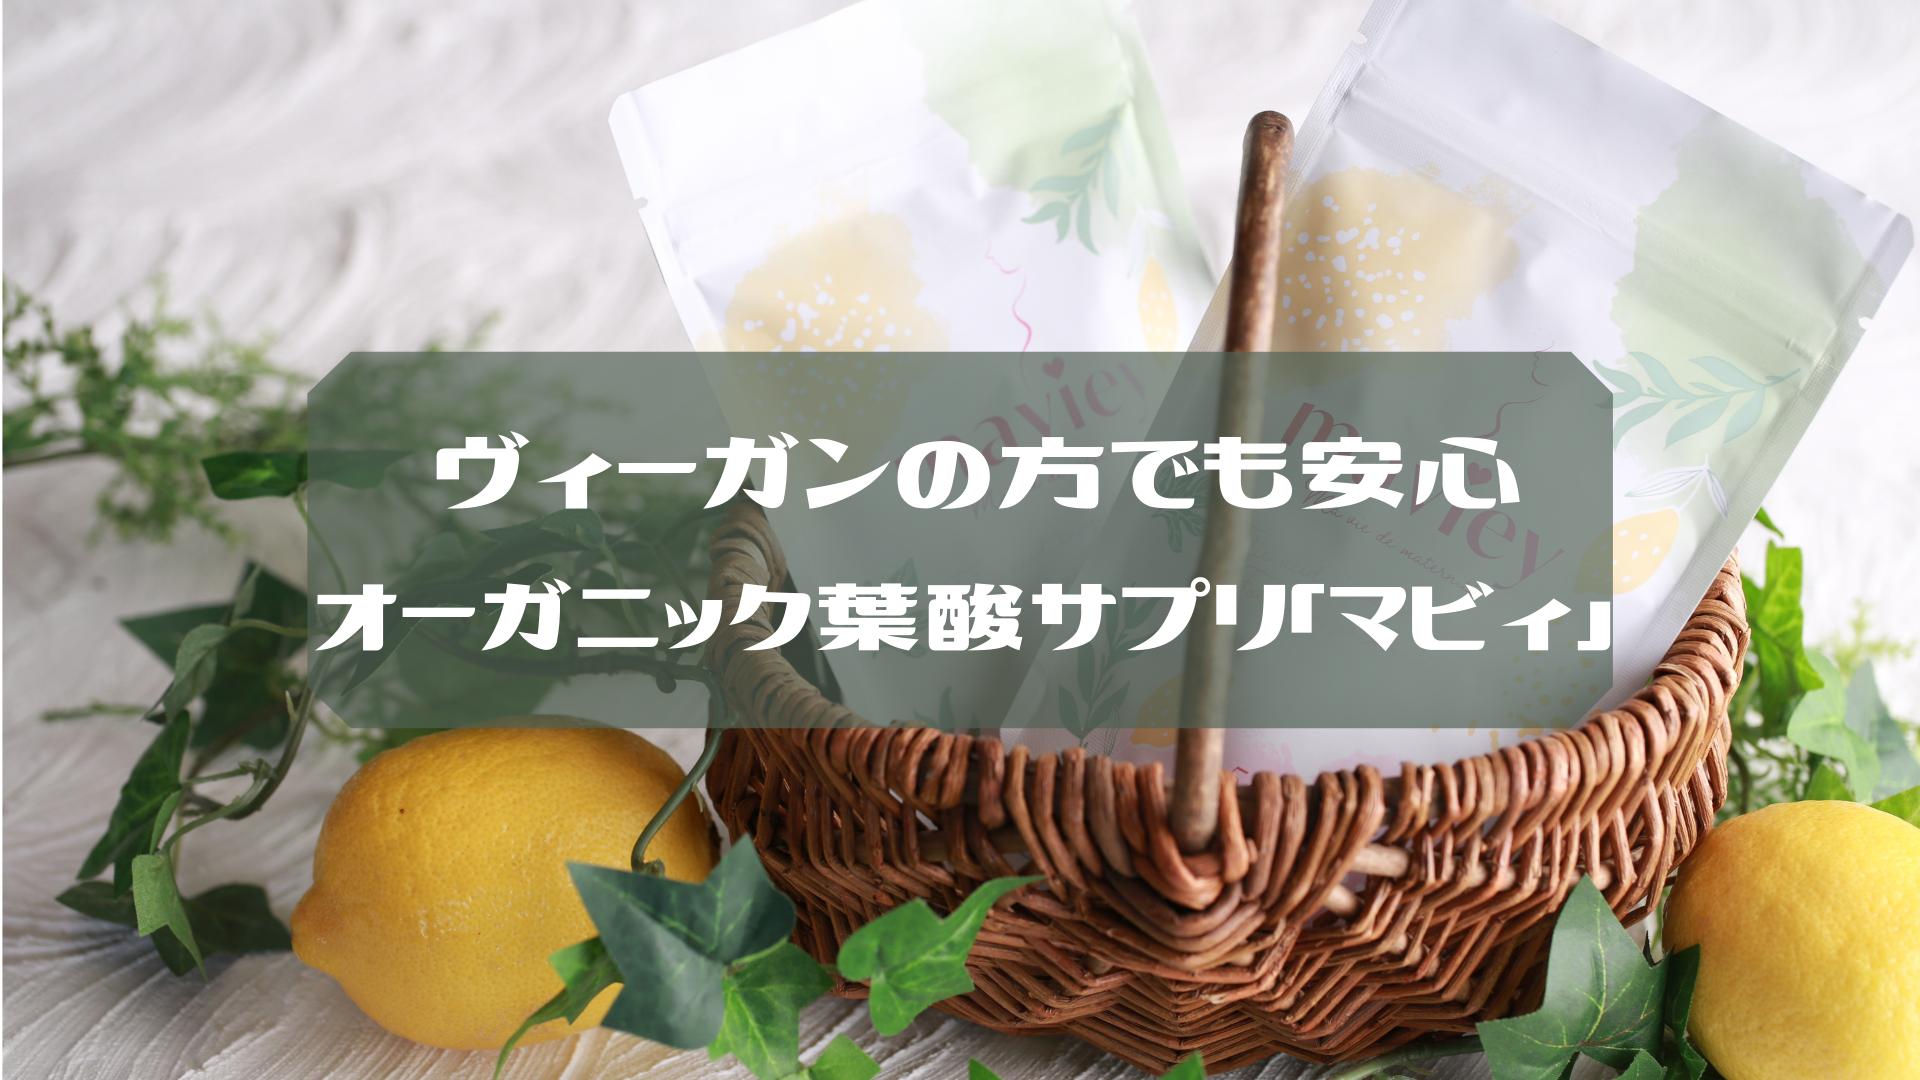 PSI初!妊活専用葉酸サプリメント【Maviey(マビィ)】が誕生